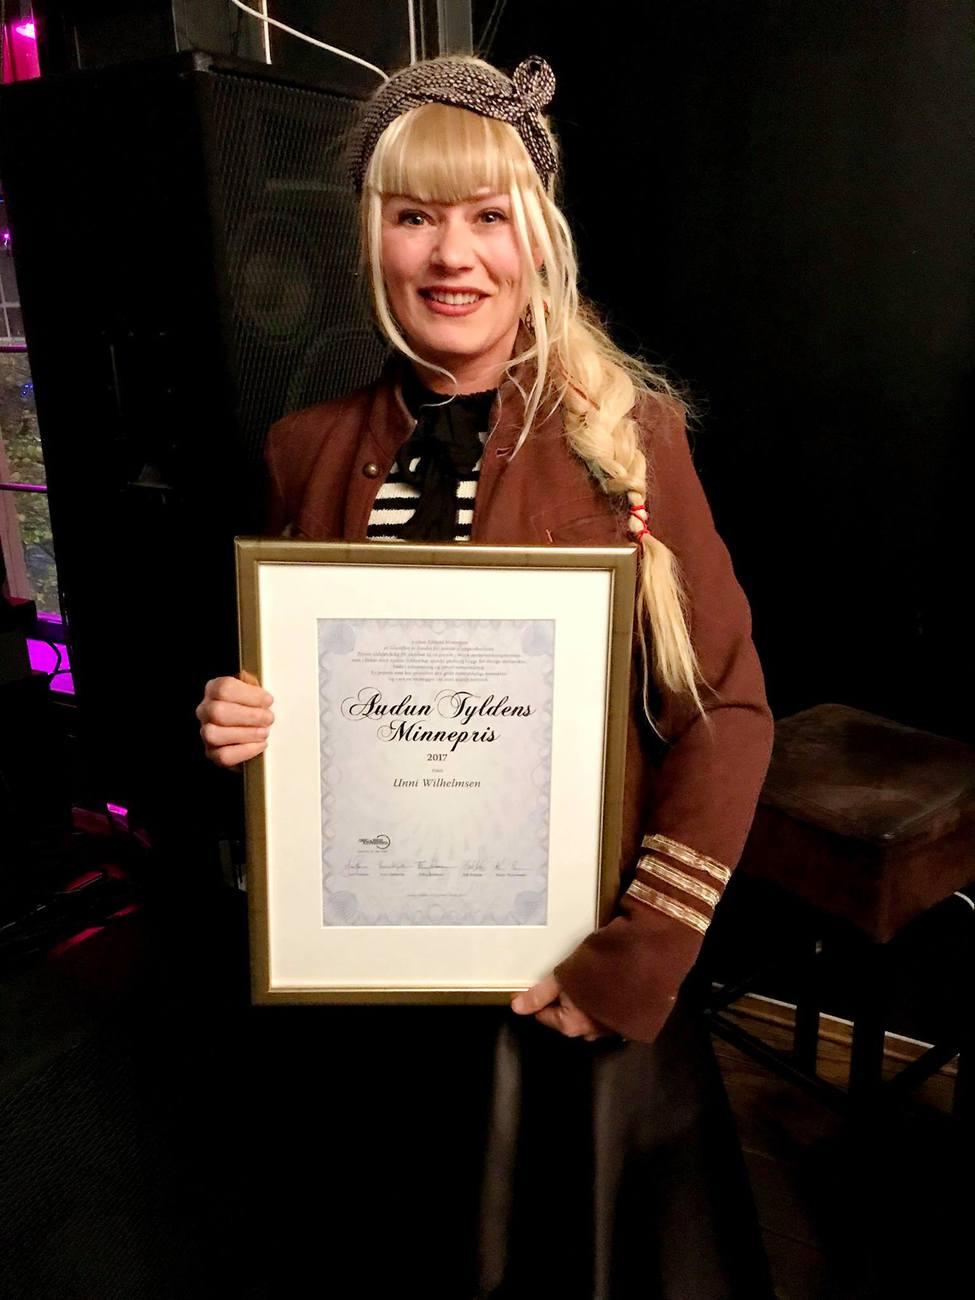 Unni Wilhelmsen, Tyldenprisen 2017